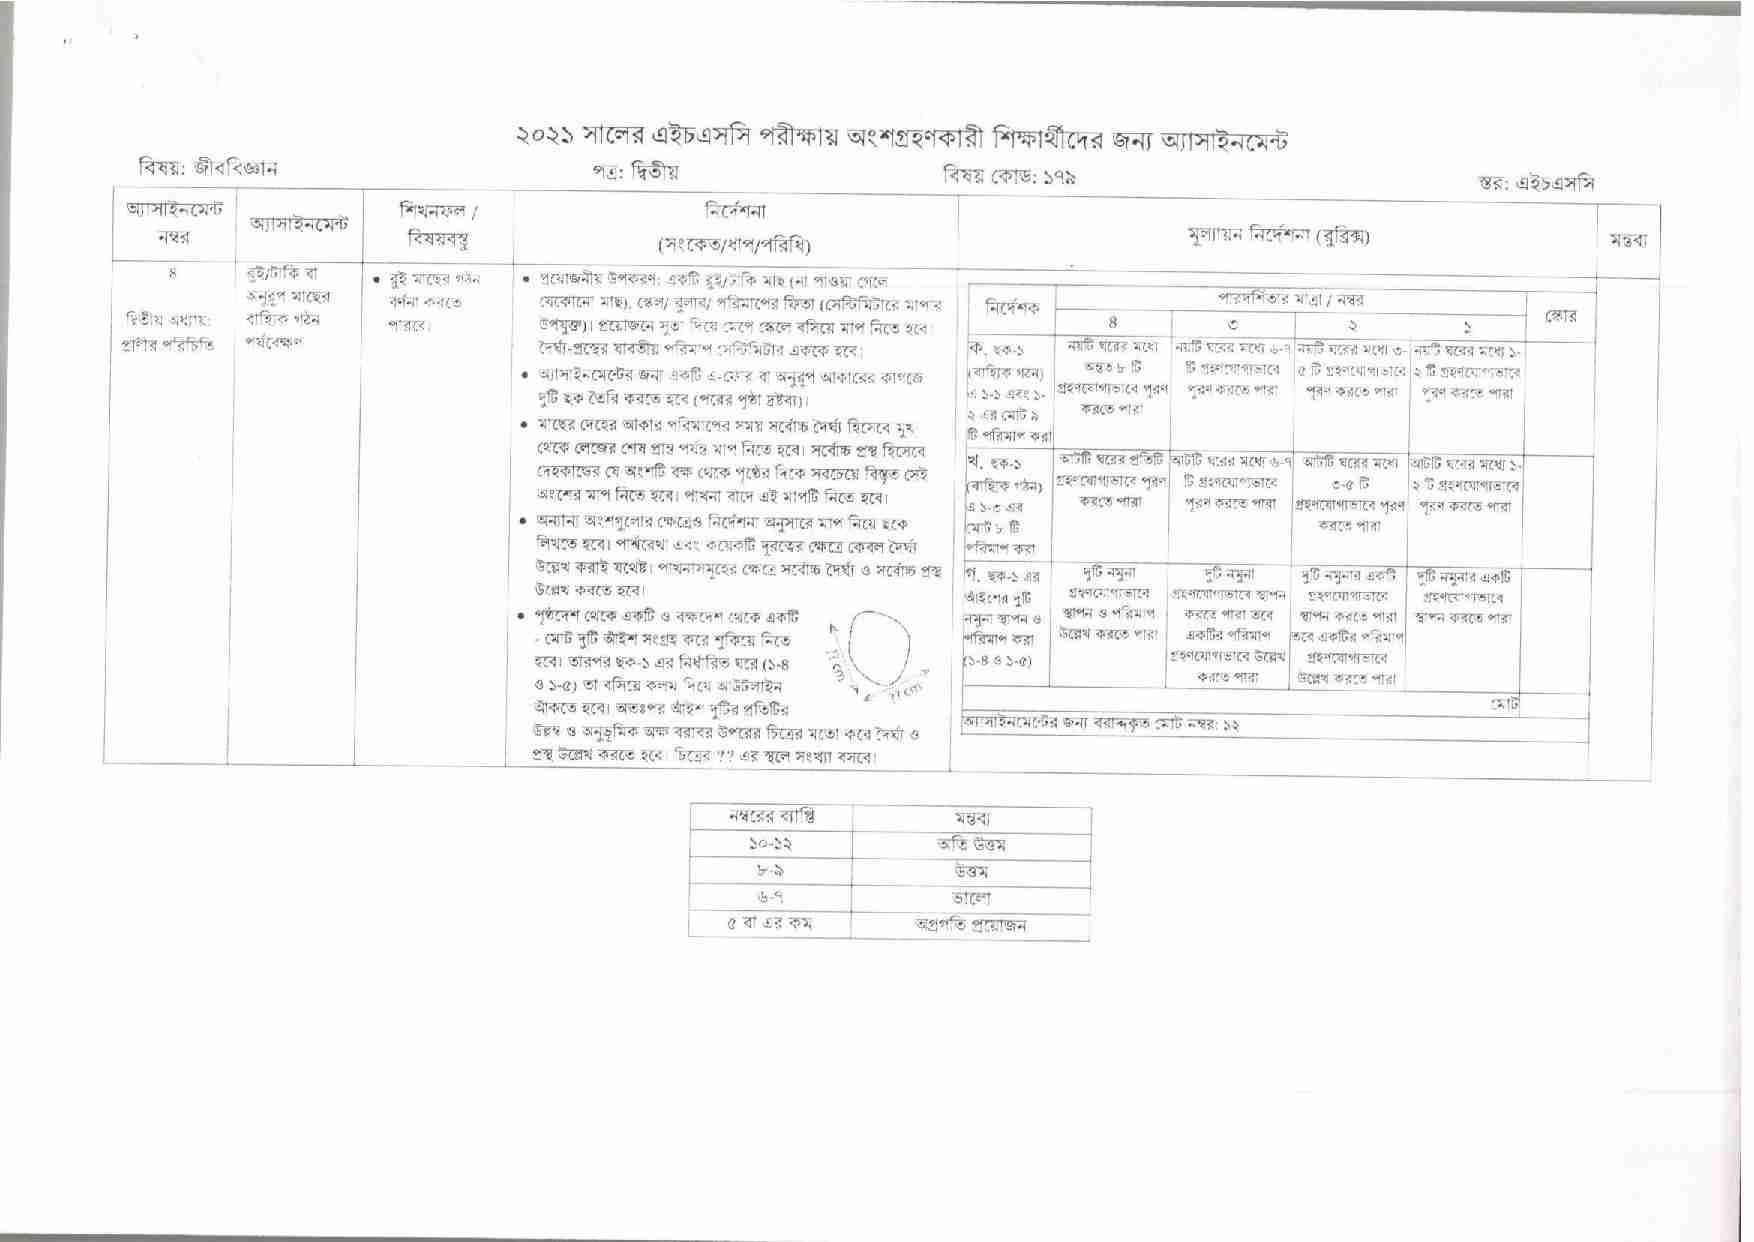 HSC 6th Week Biology Assignment Answer 2021